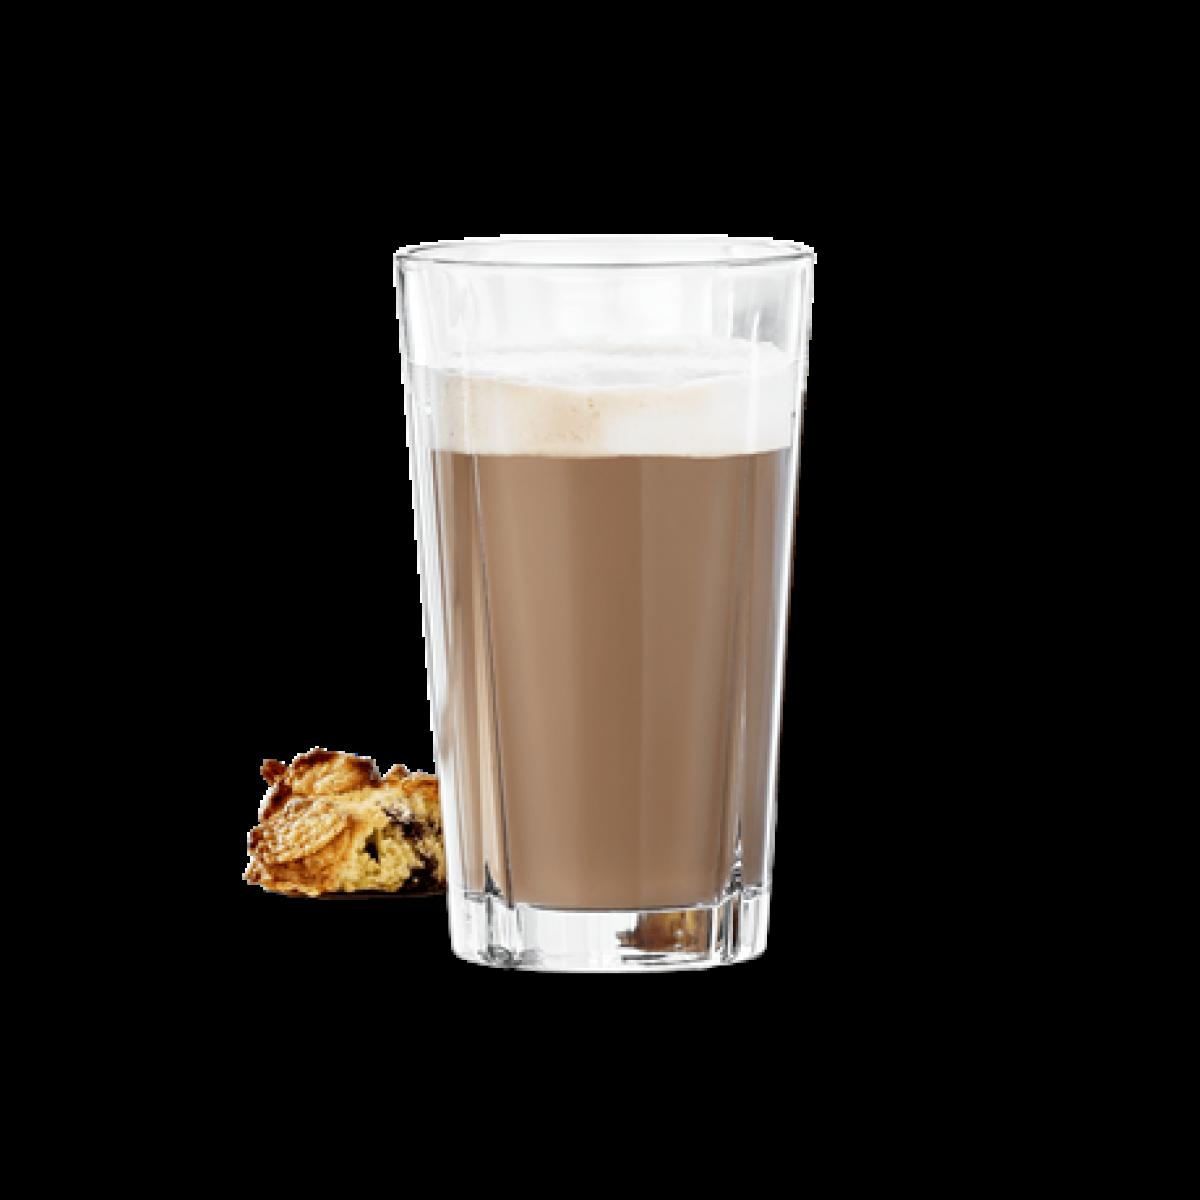 ROSENDAHL Grand Cru caféglas 4 stk. 37 cl.